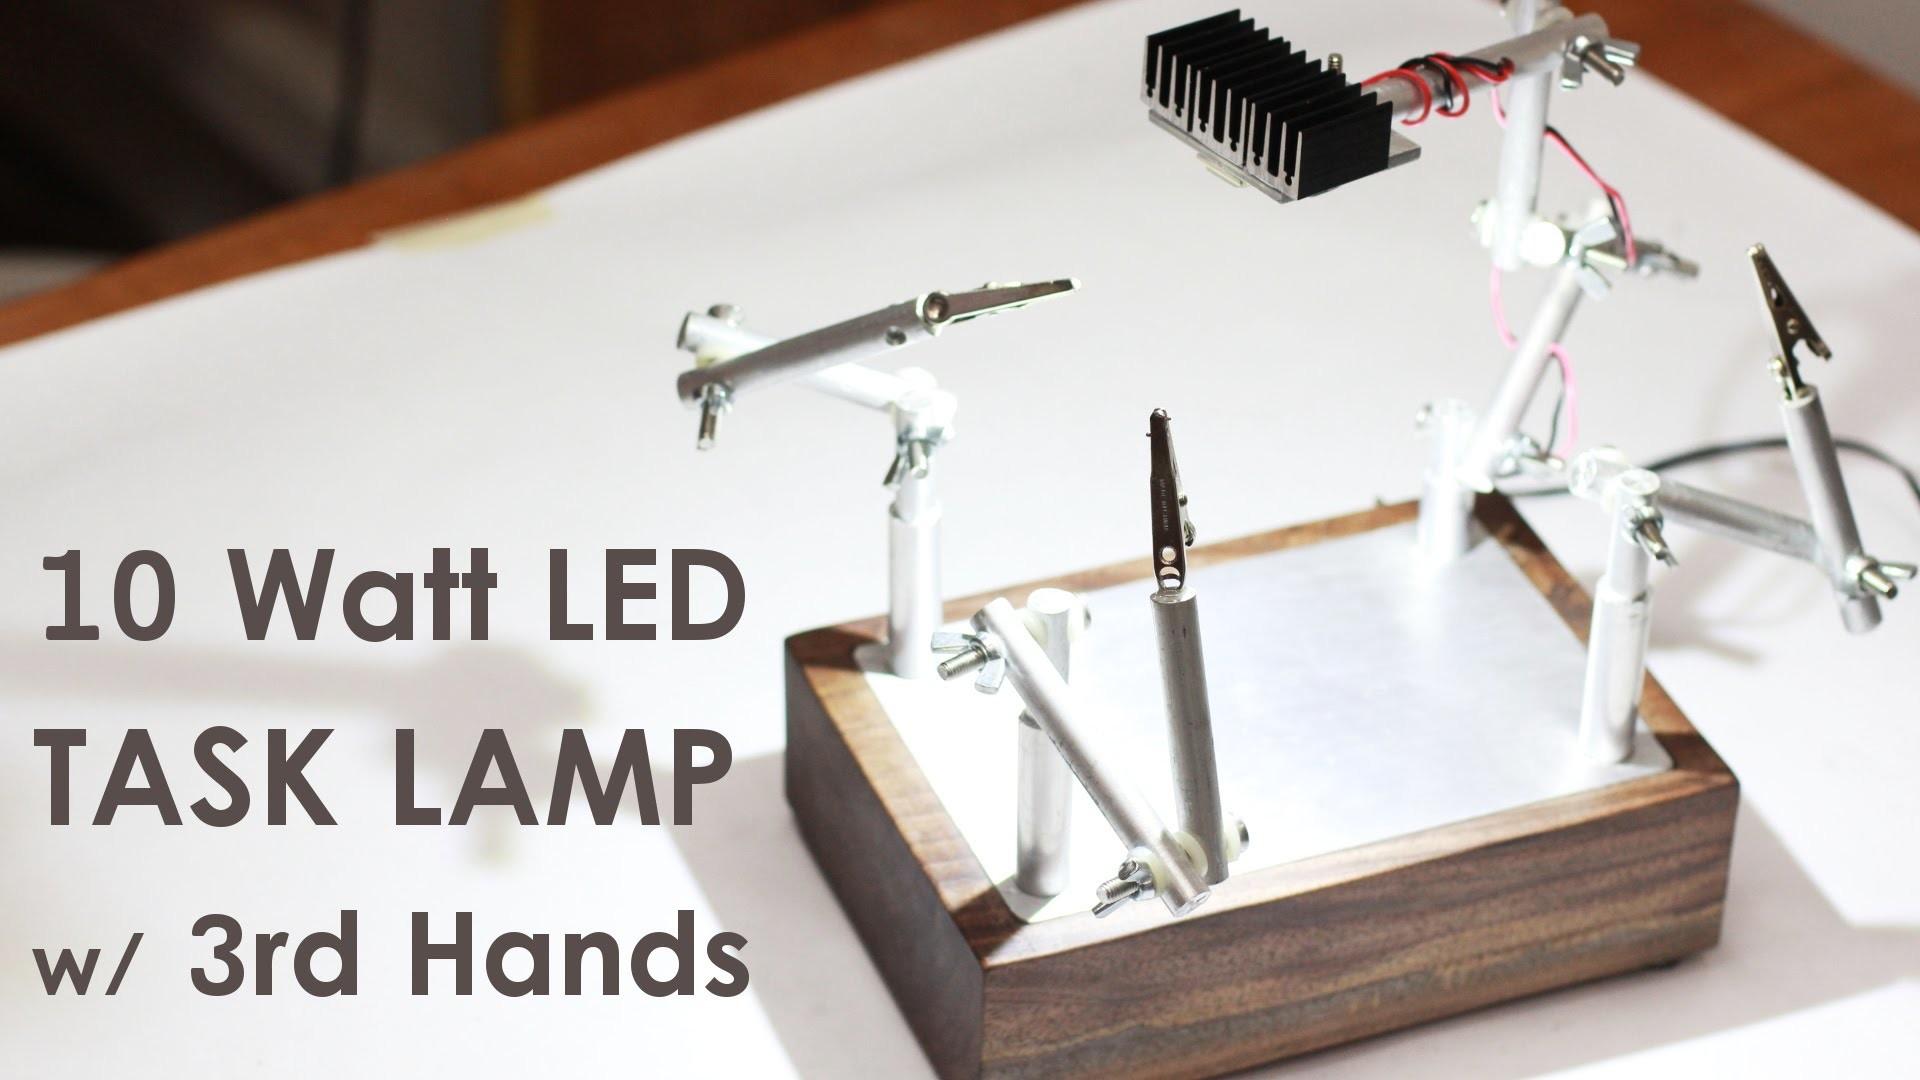 Make a Super-Bright 10 Watt LED Task Lamp w. Third Hand Soldering Holder